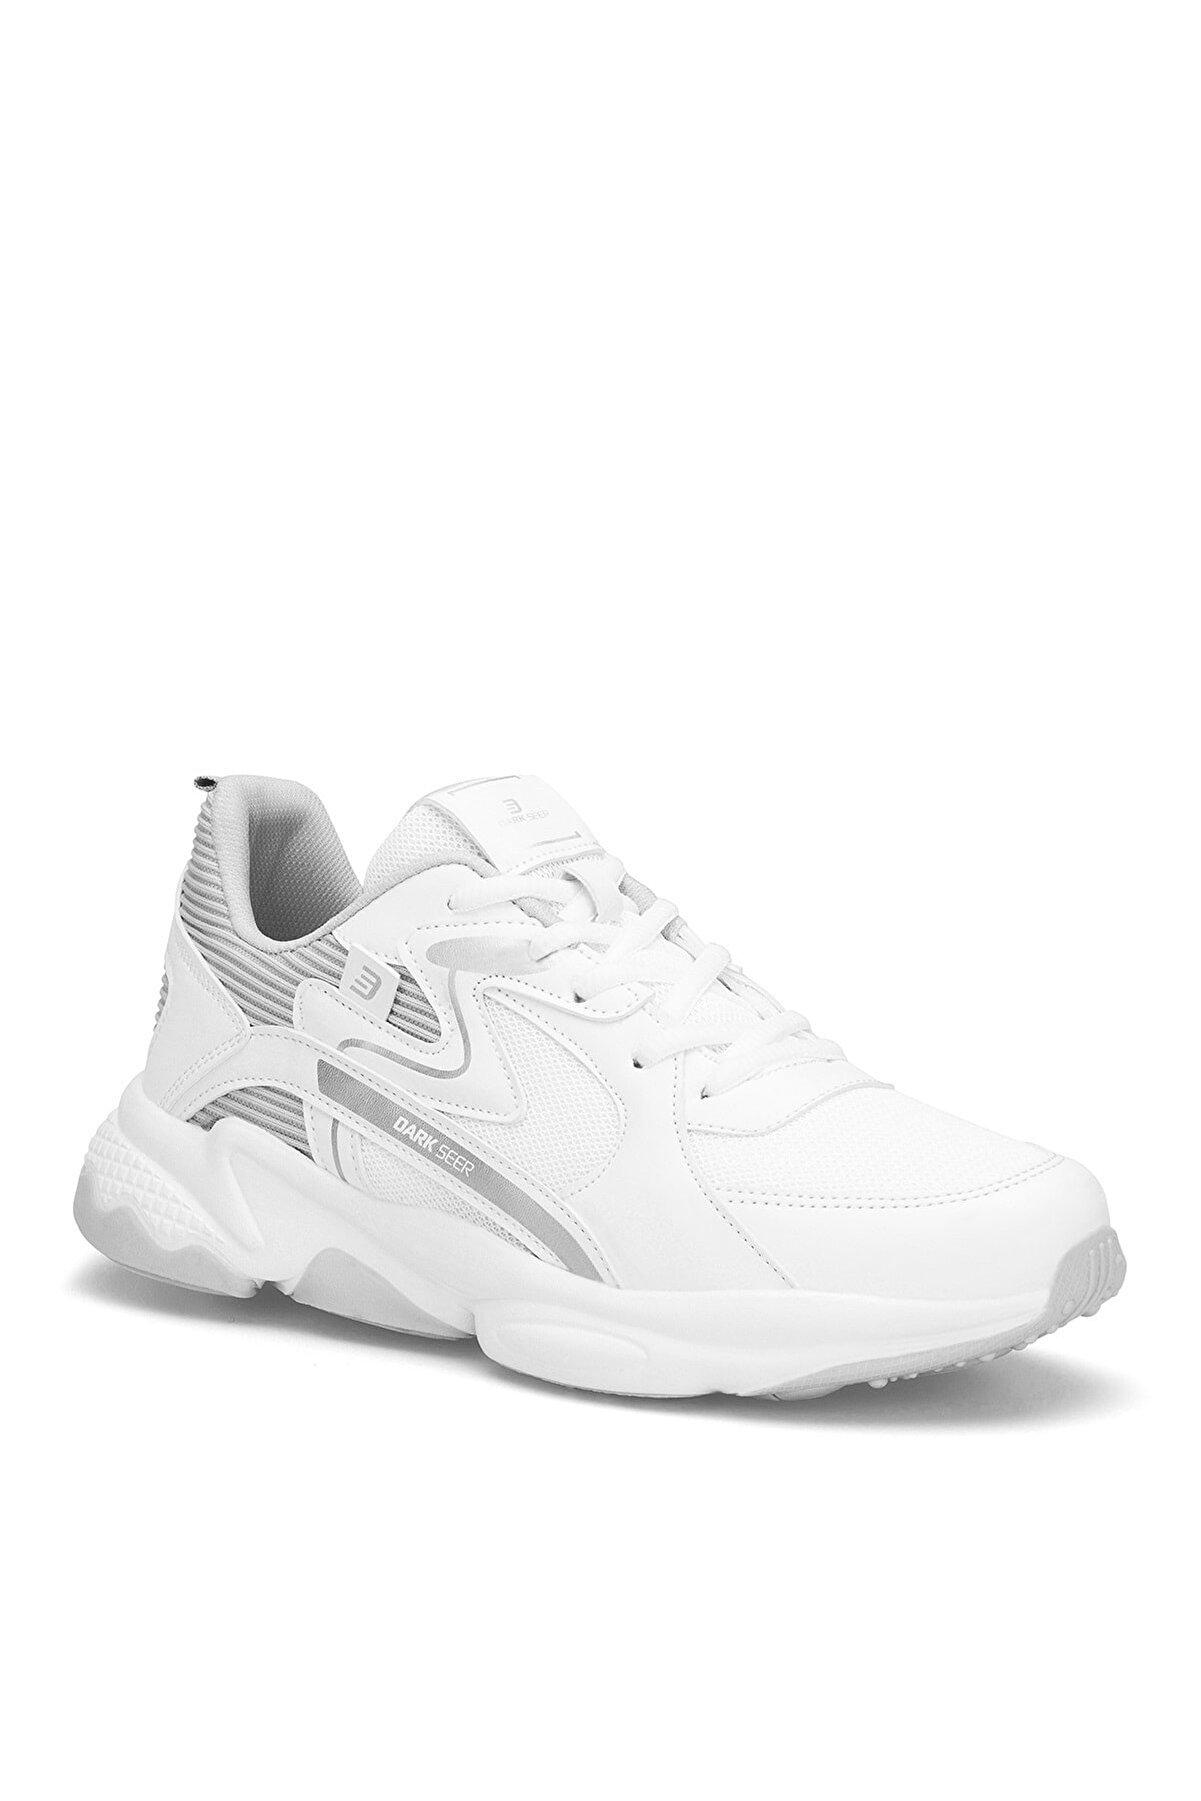 Dark Seer Full Beyaz Erkek Sneaker